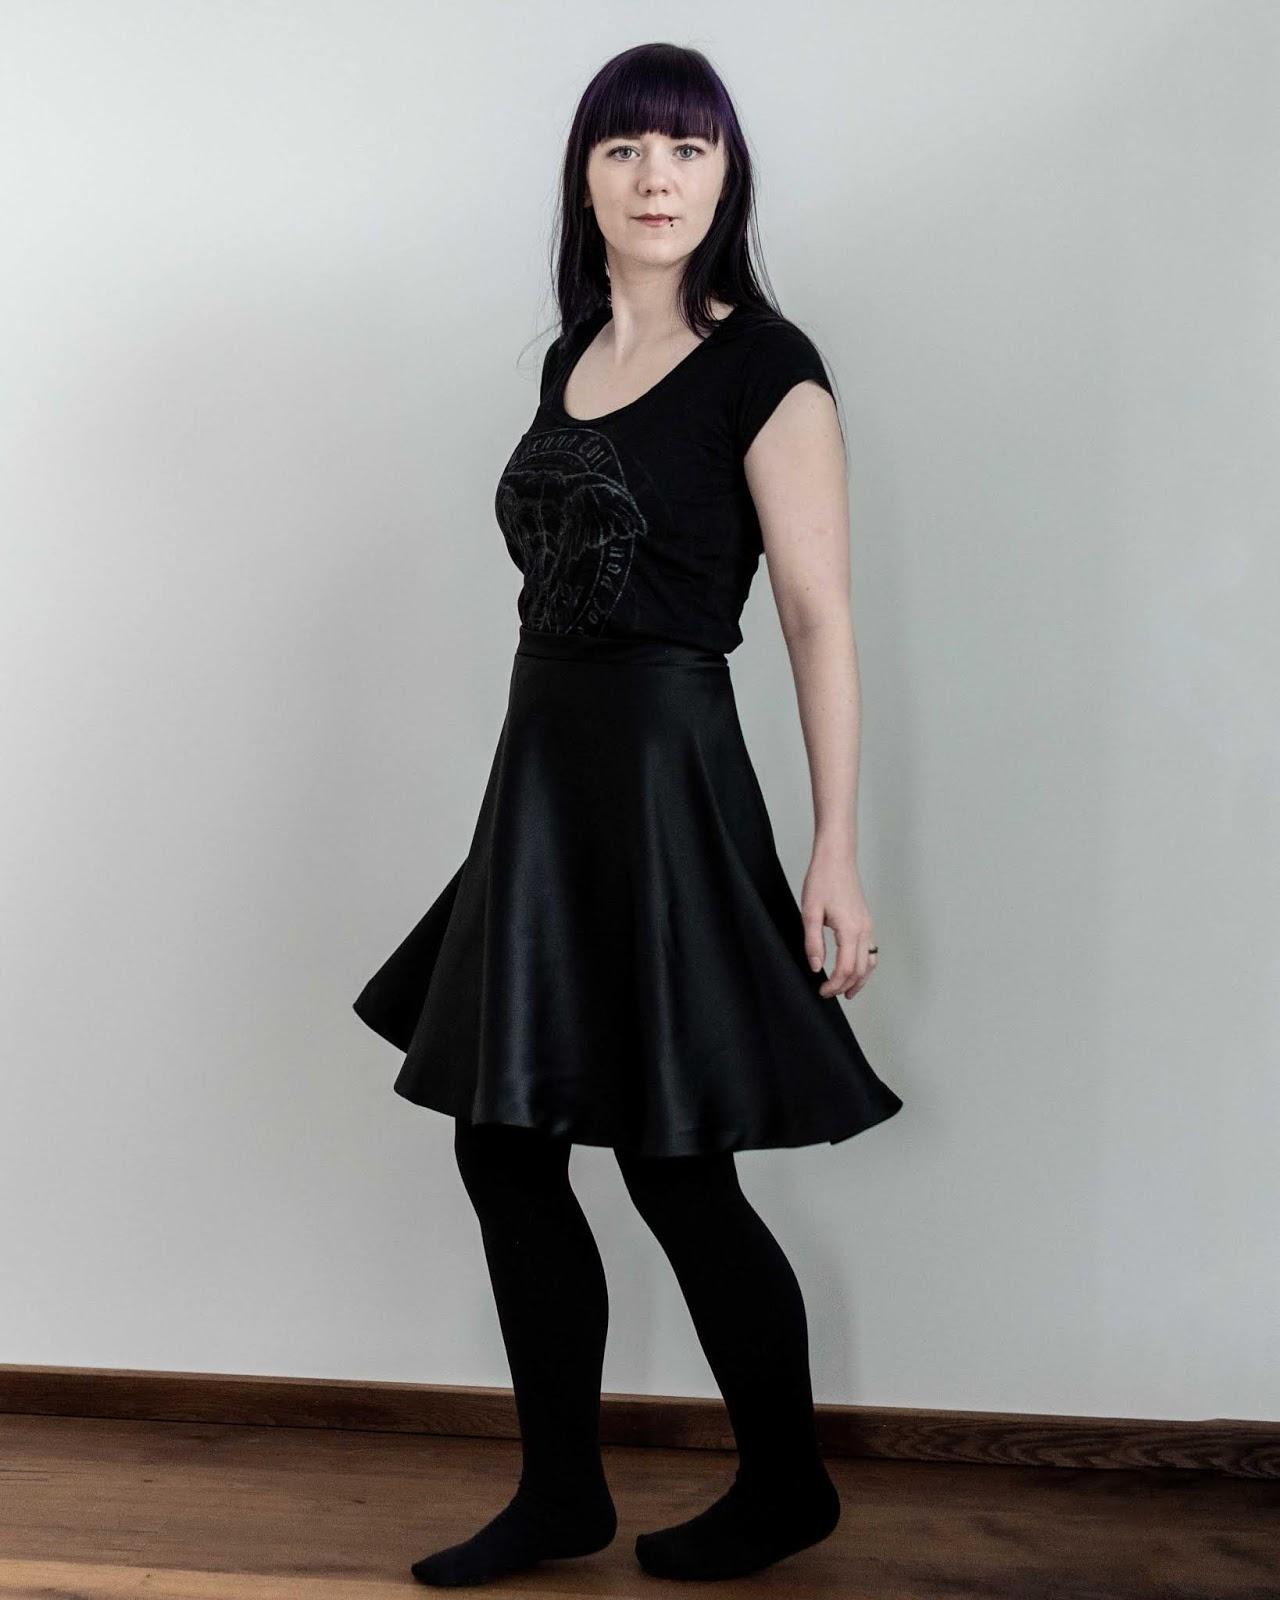 half circle skirt sewing Minn's Things calculator self drafted handmade diy free twirling woman